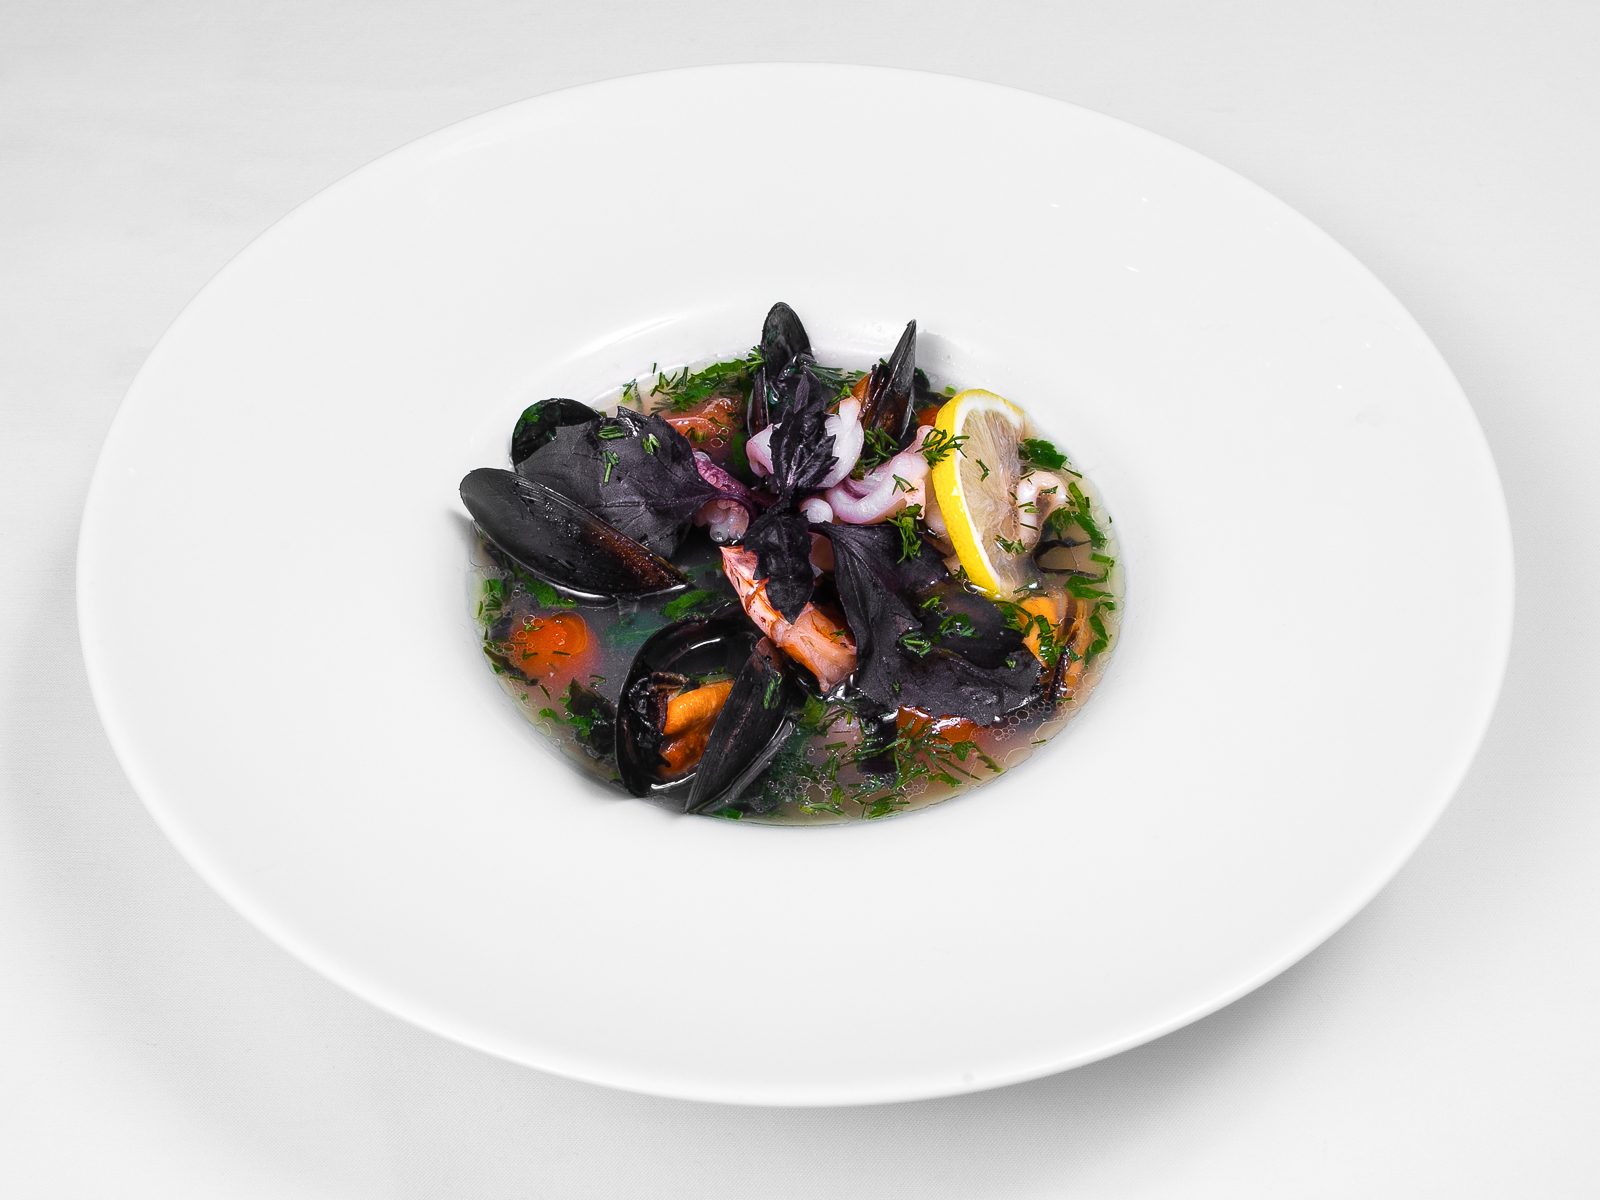 Суп с морепродуктами и помидорами черри